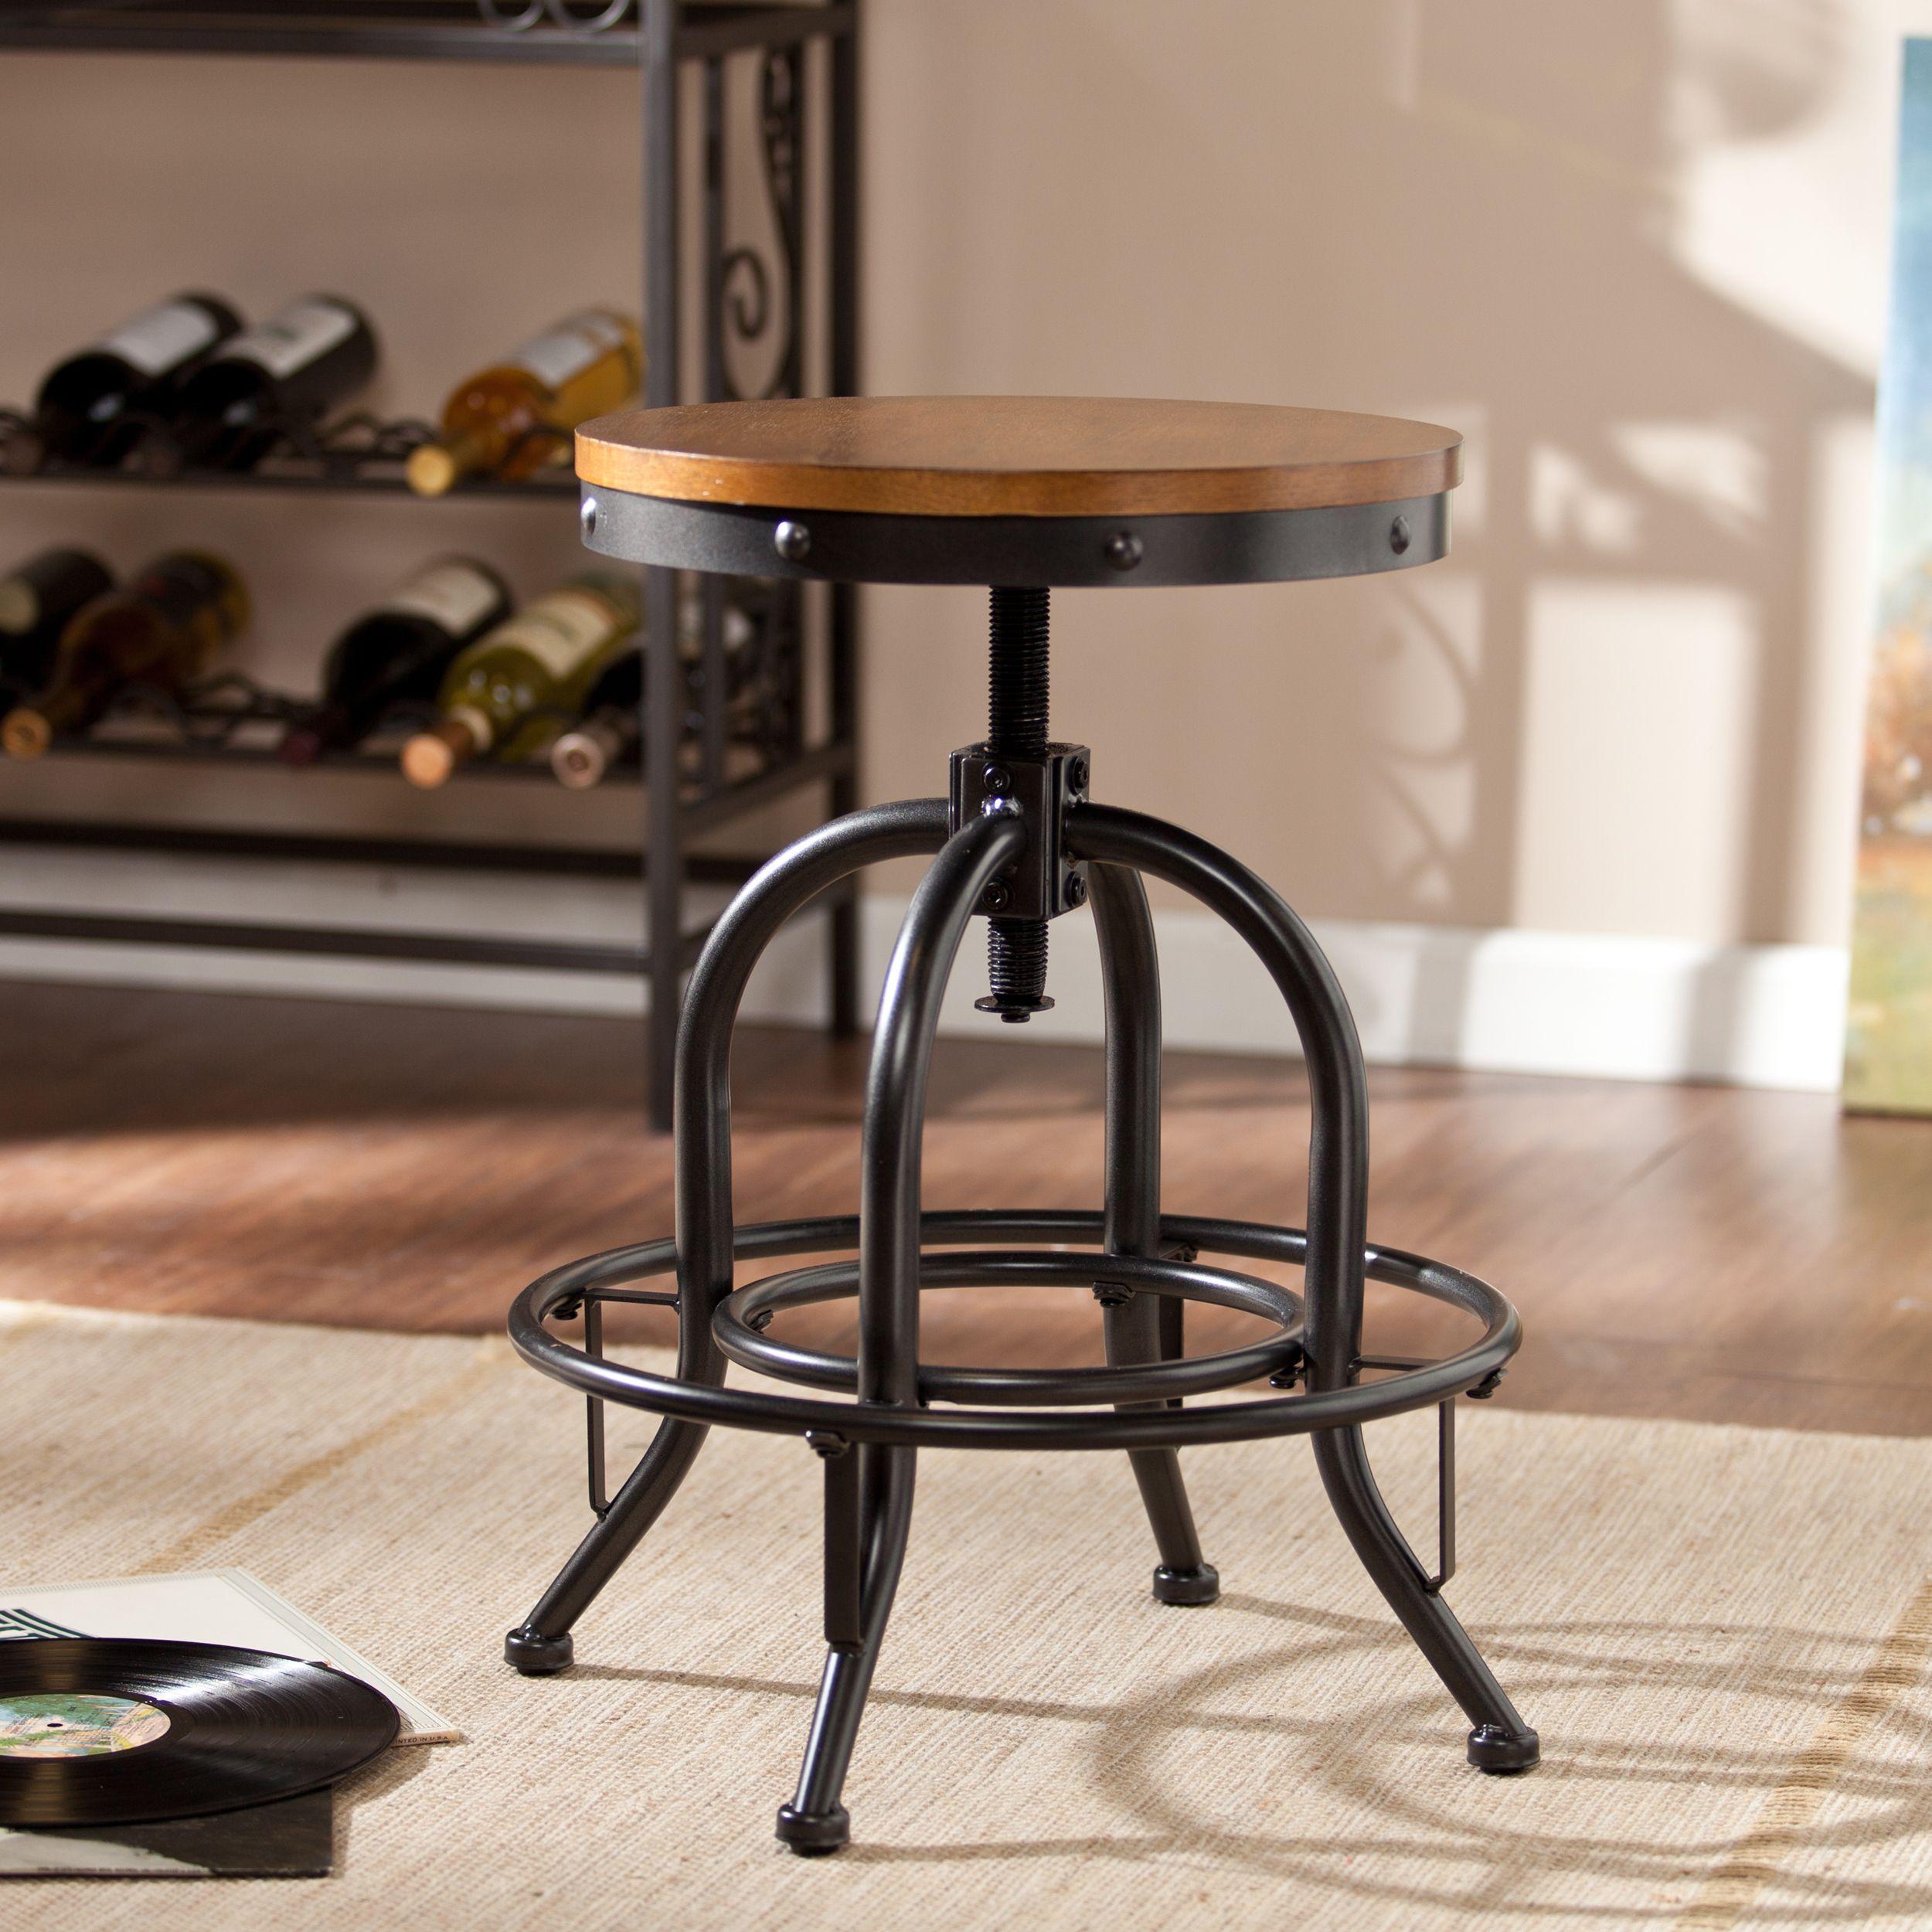 Carbon Loft Horstmann Dark Pine Black Industrial Style Adjustable Stool Os3542cb Iron Furniture Industrial Stool